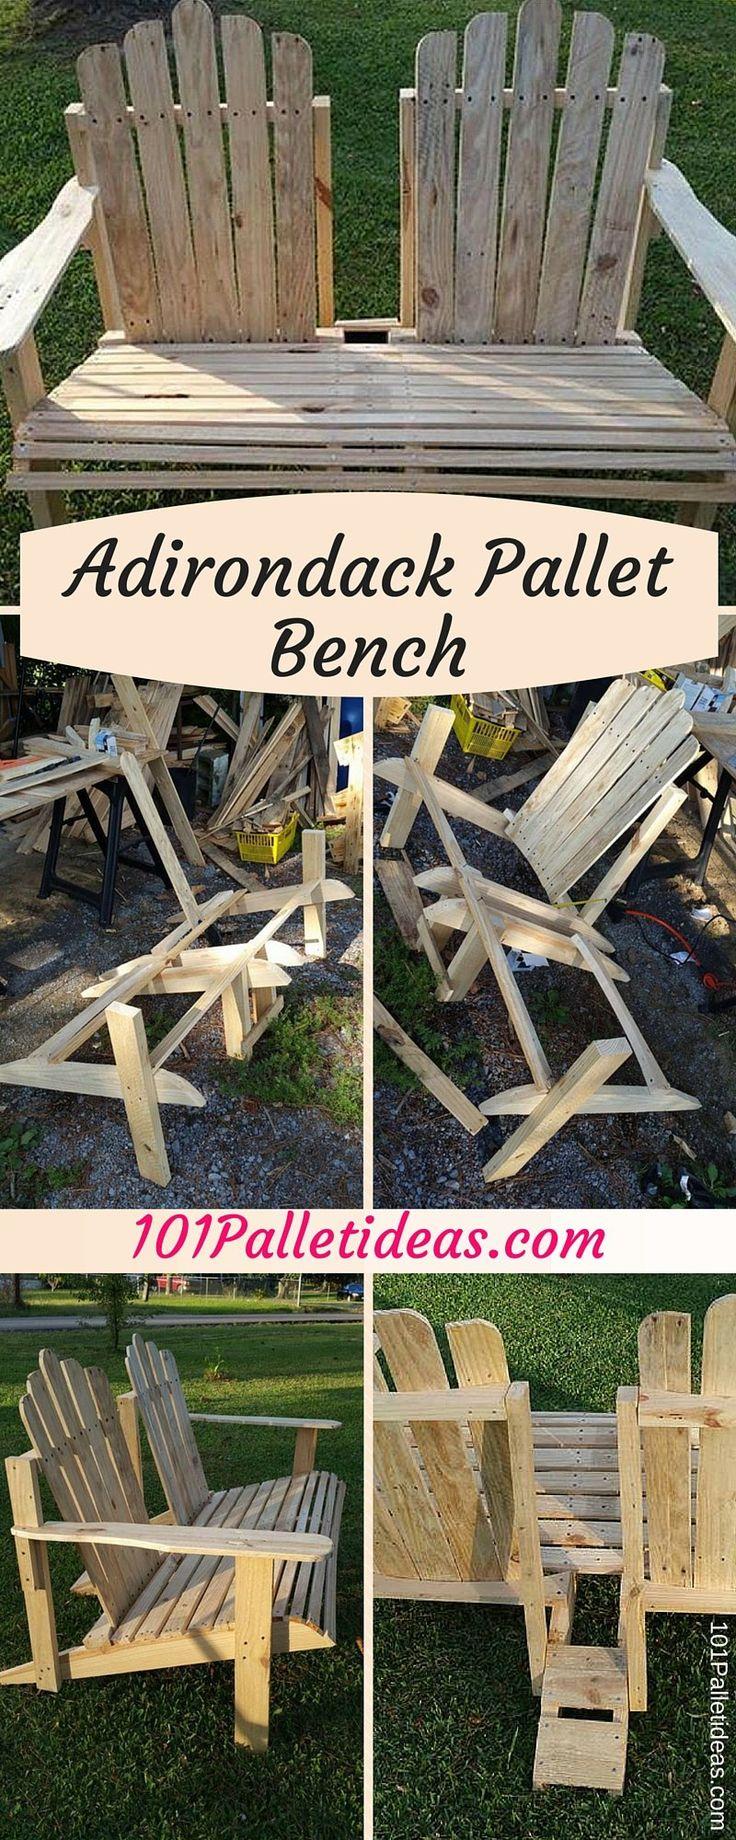 #Adirondack Pallet Bench   101 Pallet Ideas